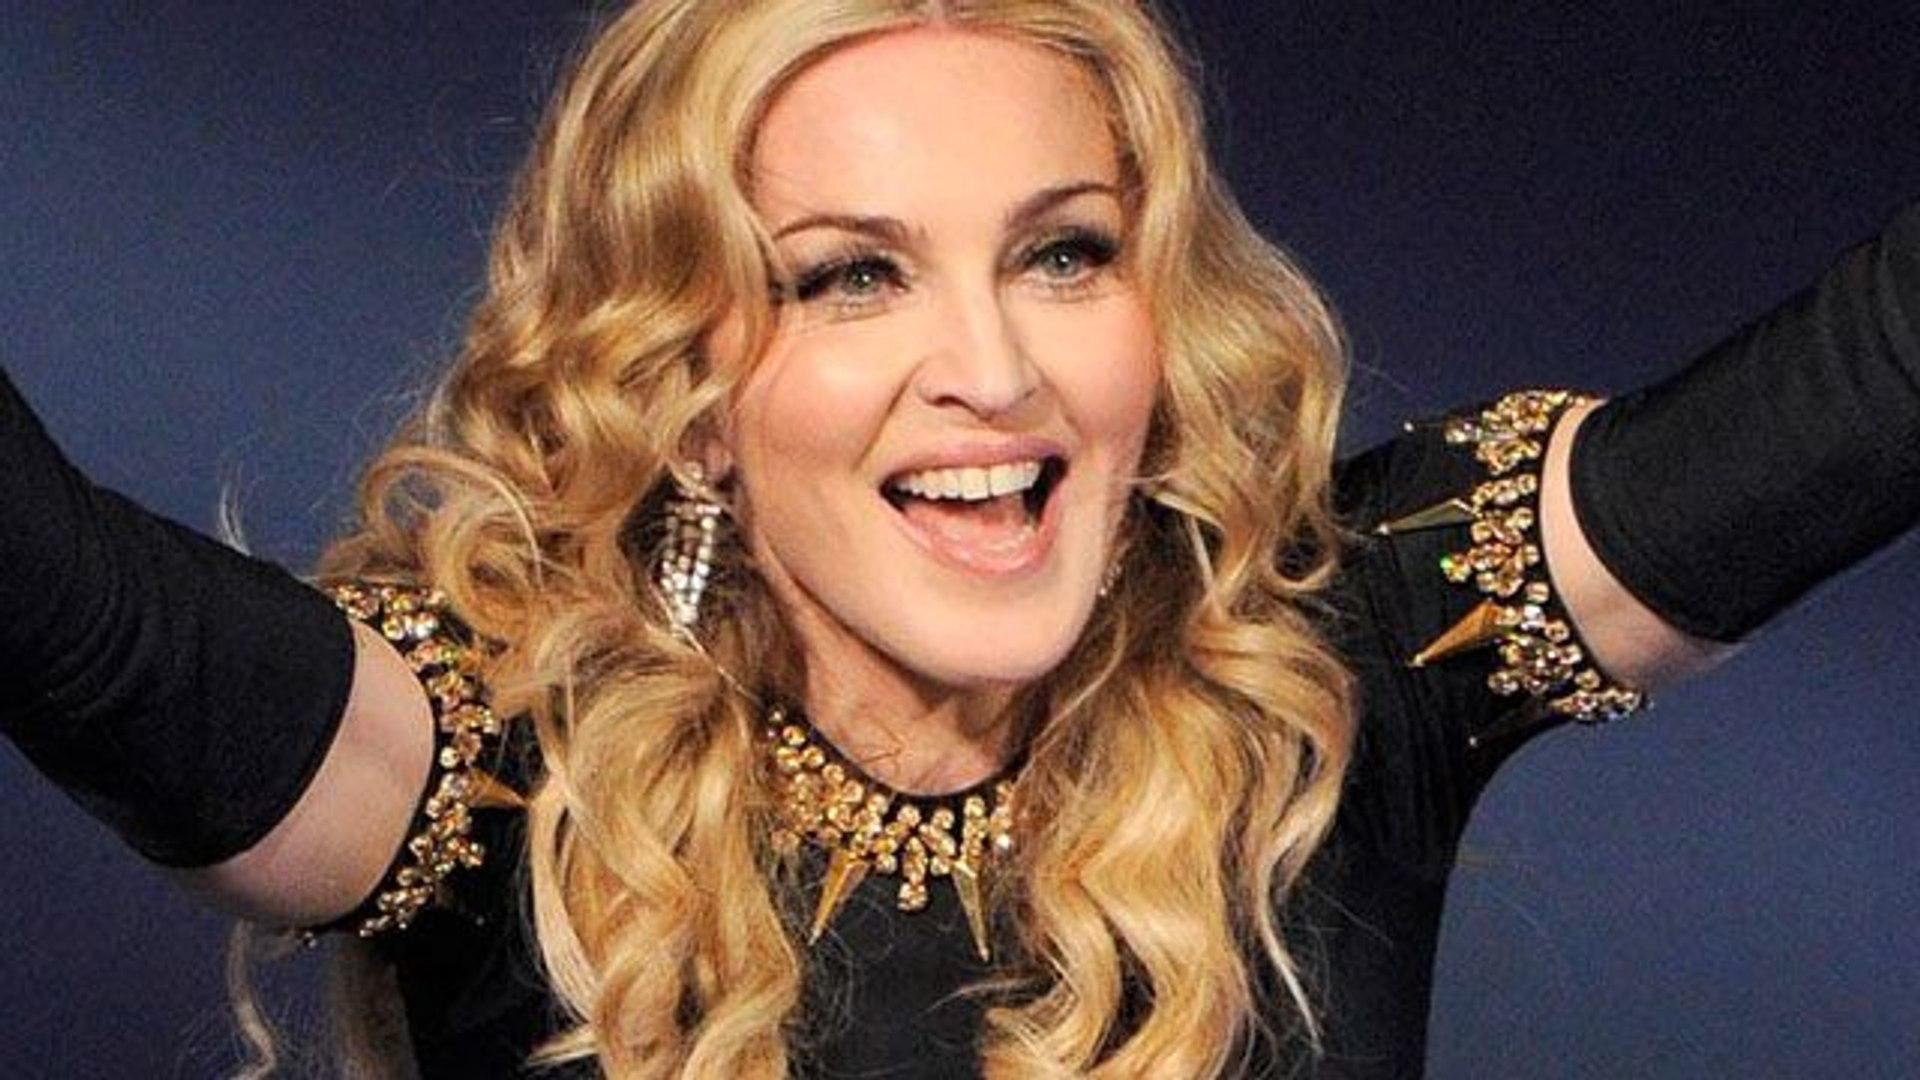 Hollywood Style Stars - Hollywood Style Star: Madonna